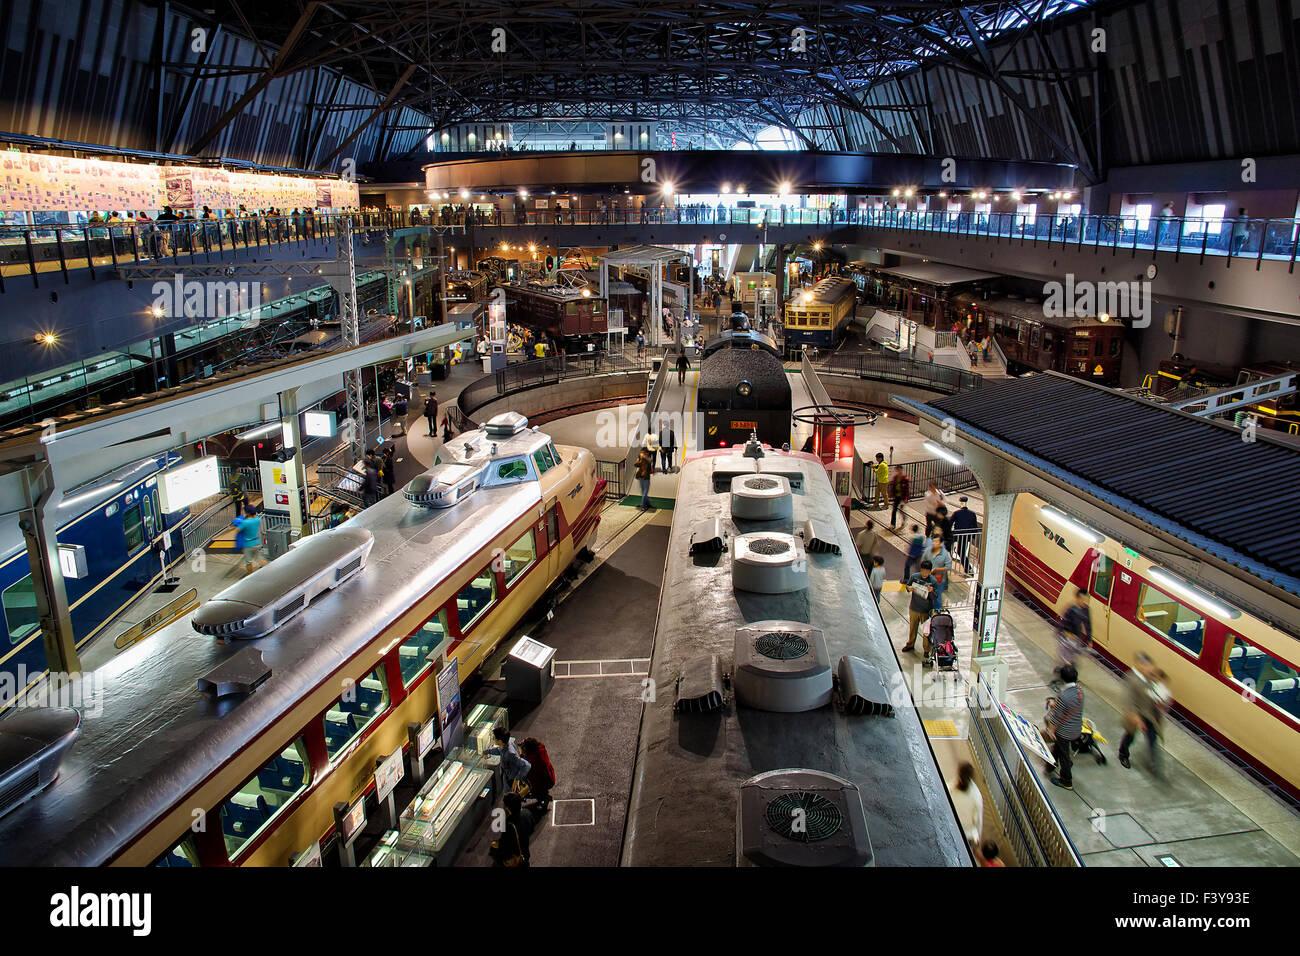 Japan, Honshu island, Kanto, Tokyo, train Museum. - Stock Image